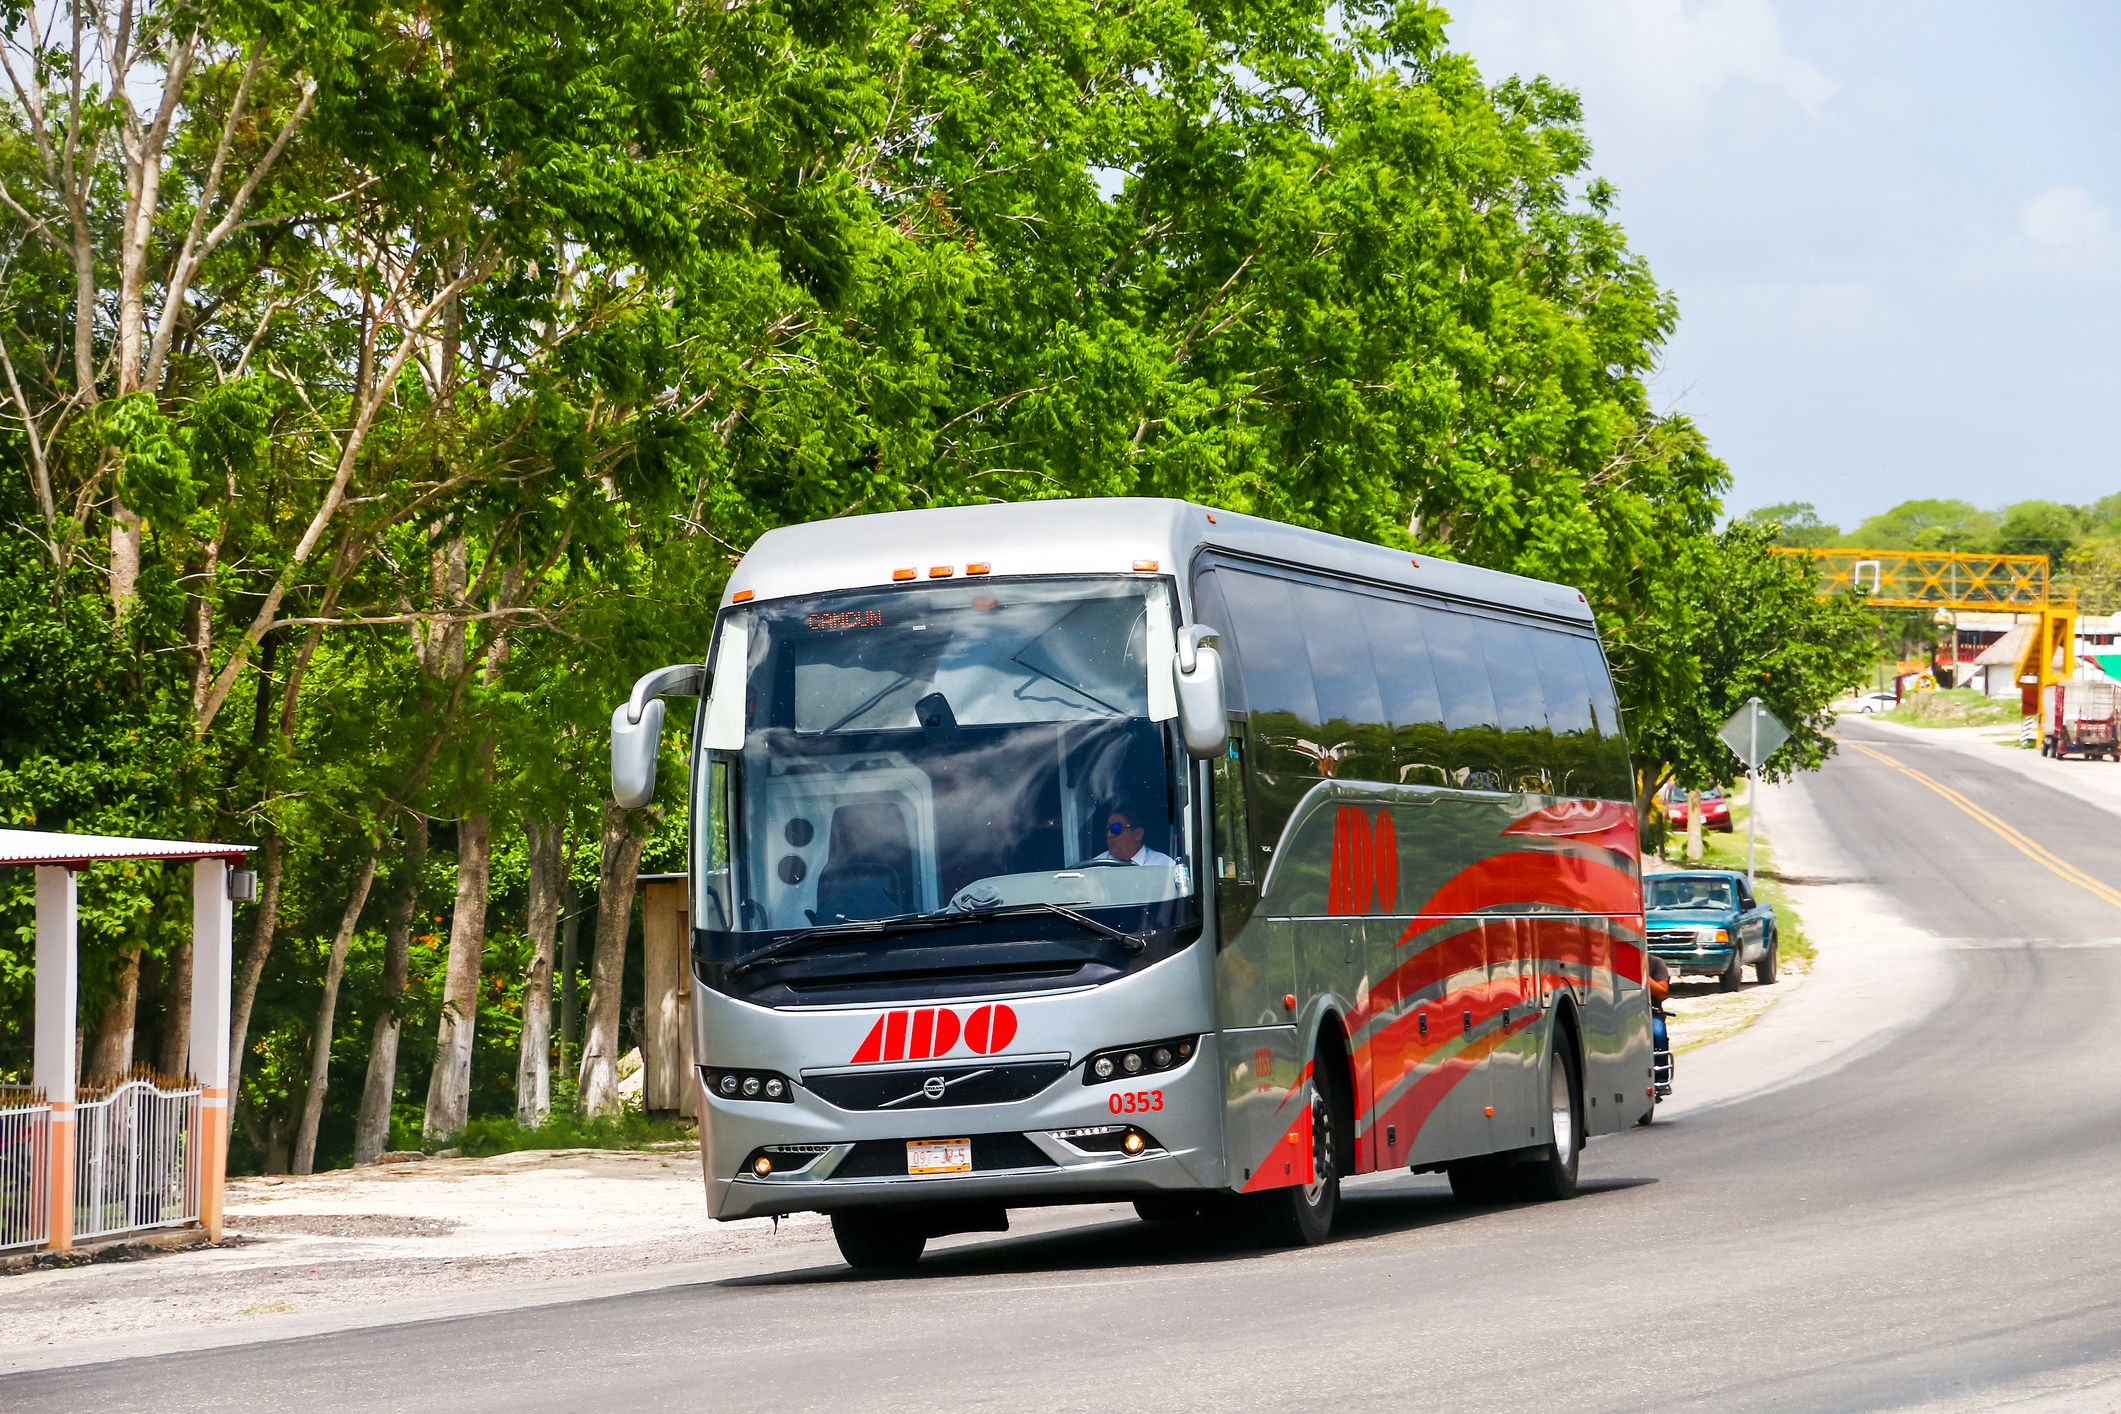 ADO bus driving in Mexico